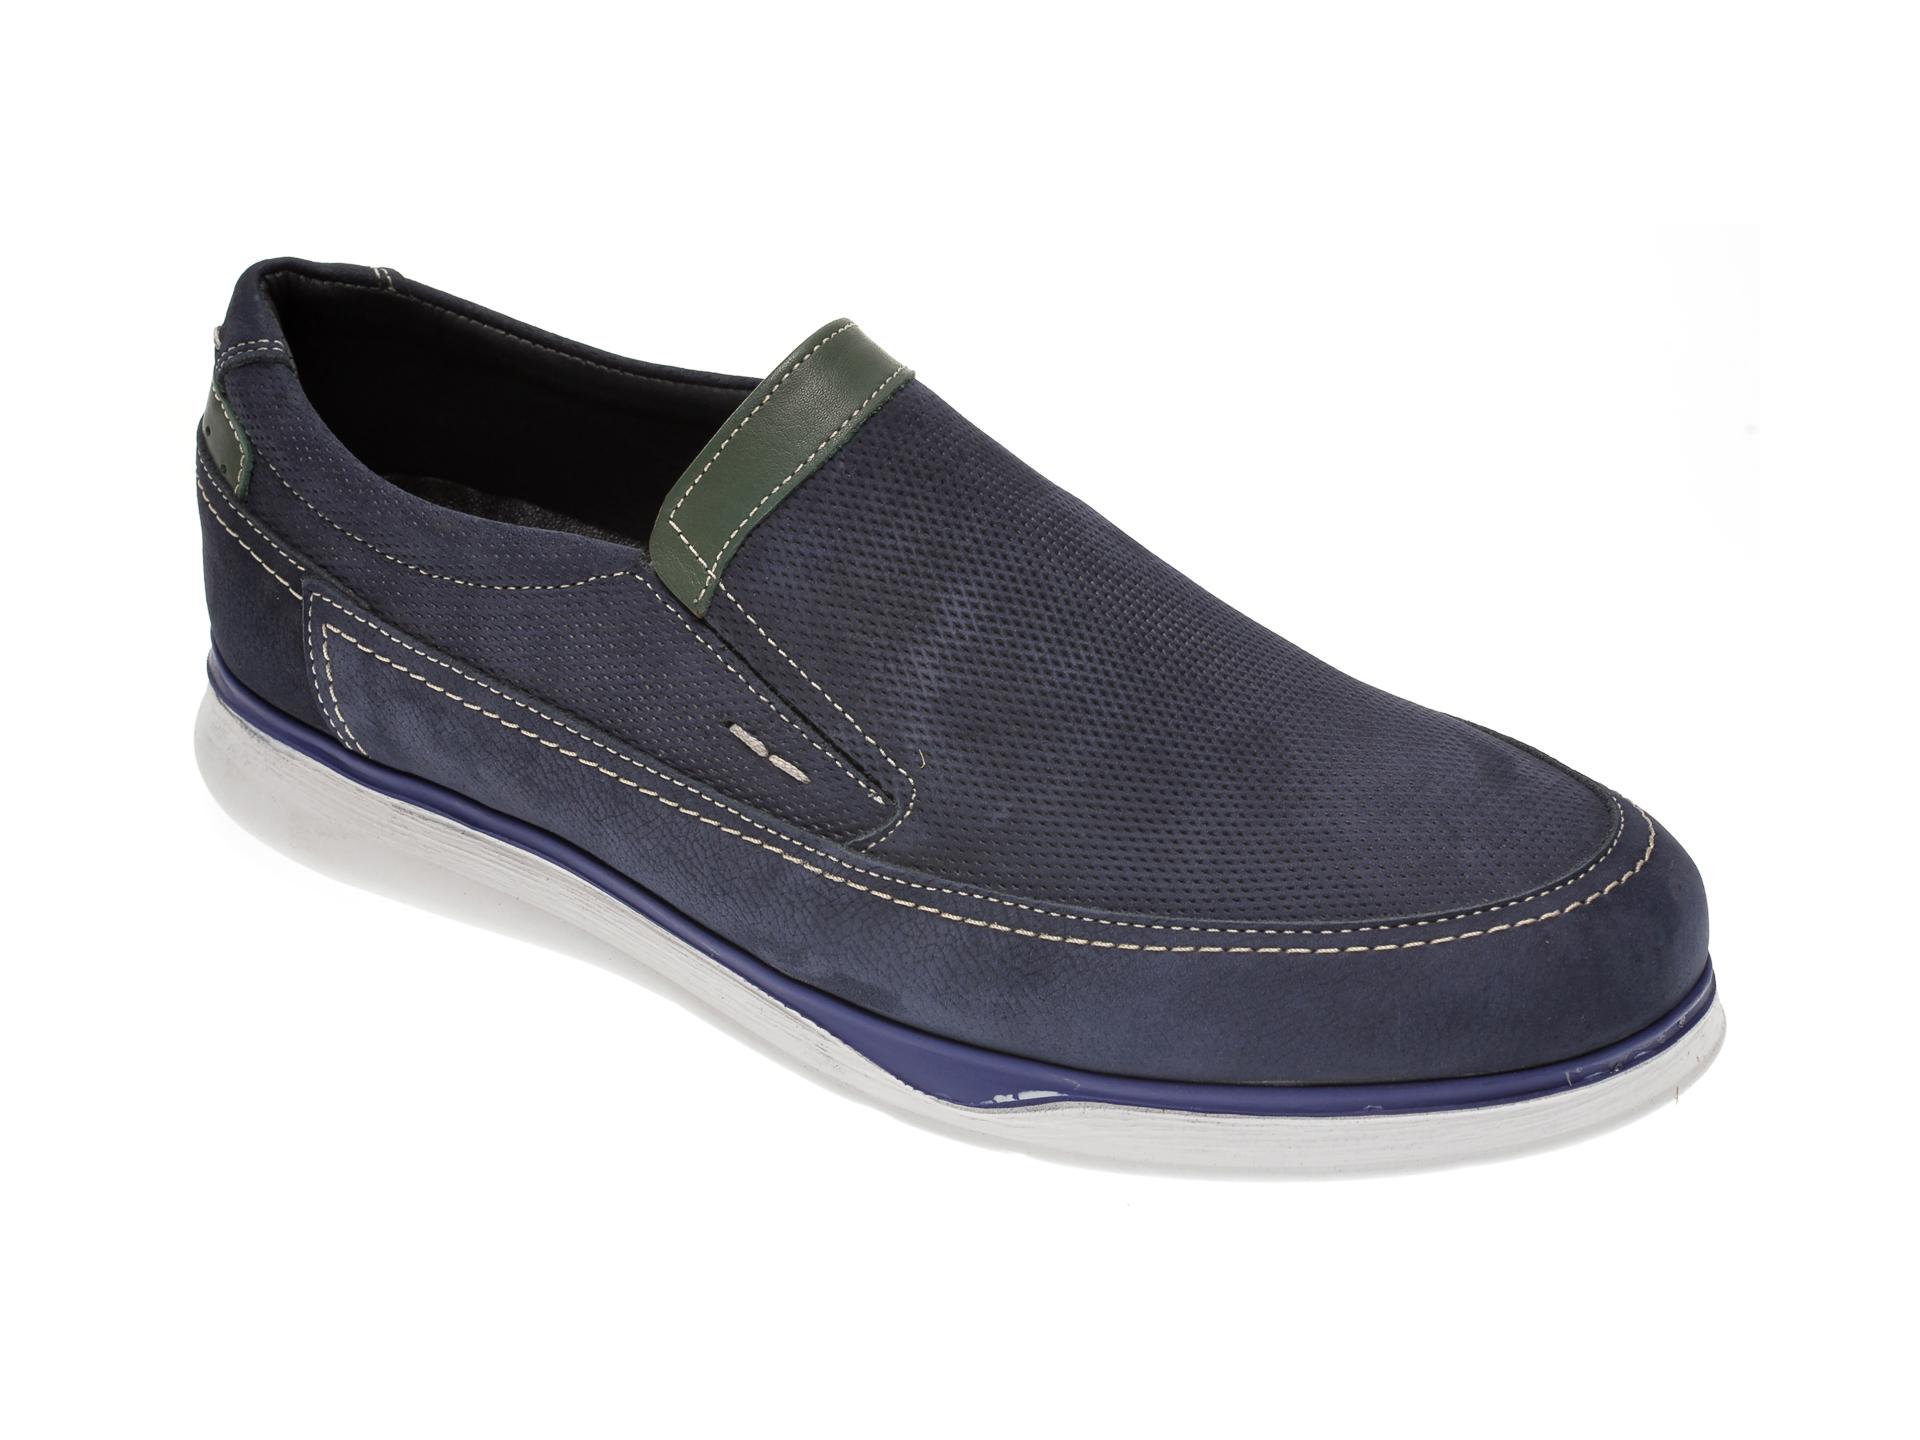 Pantofi OTTER bleumarin, 19331, din piele intoarsa imagine